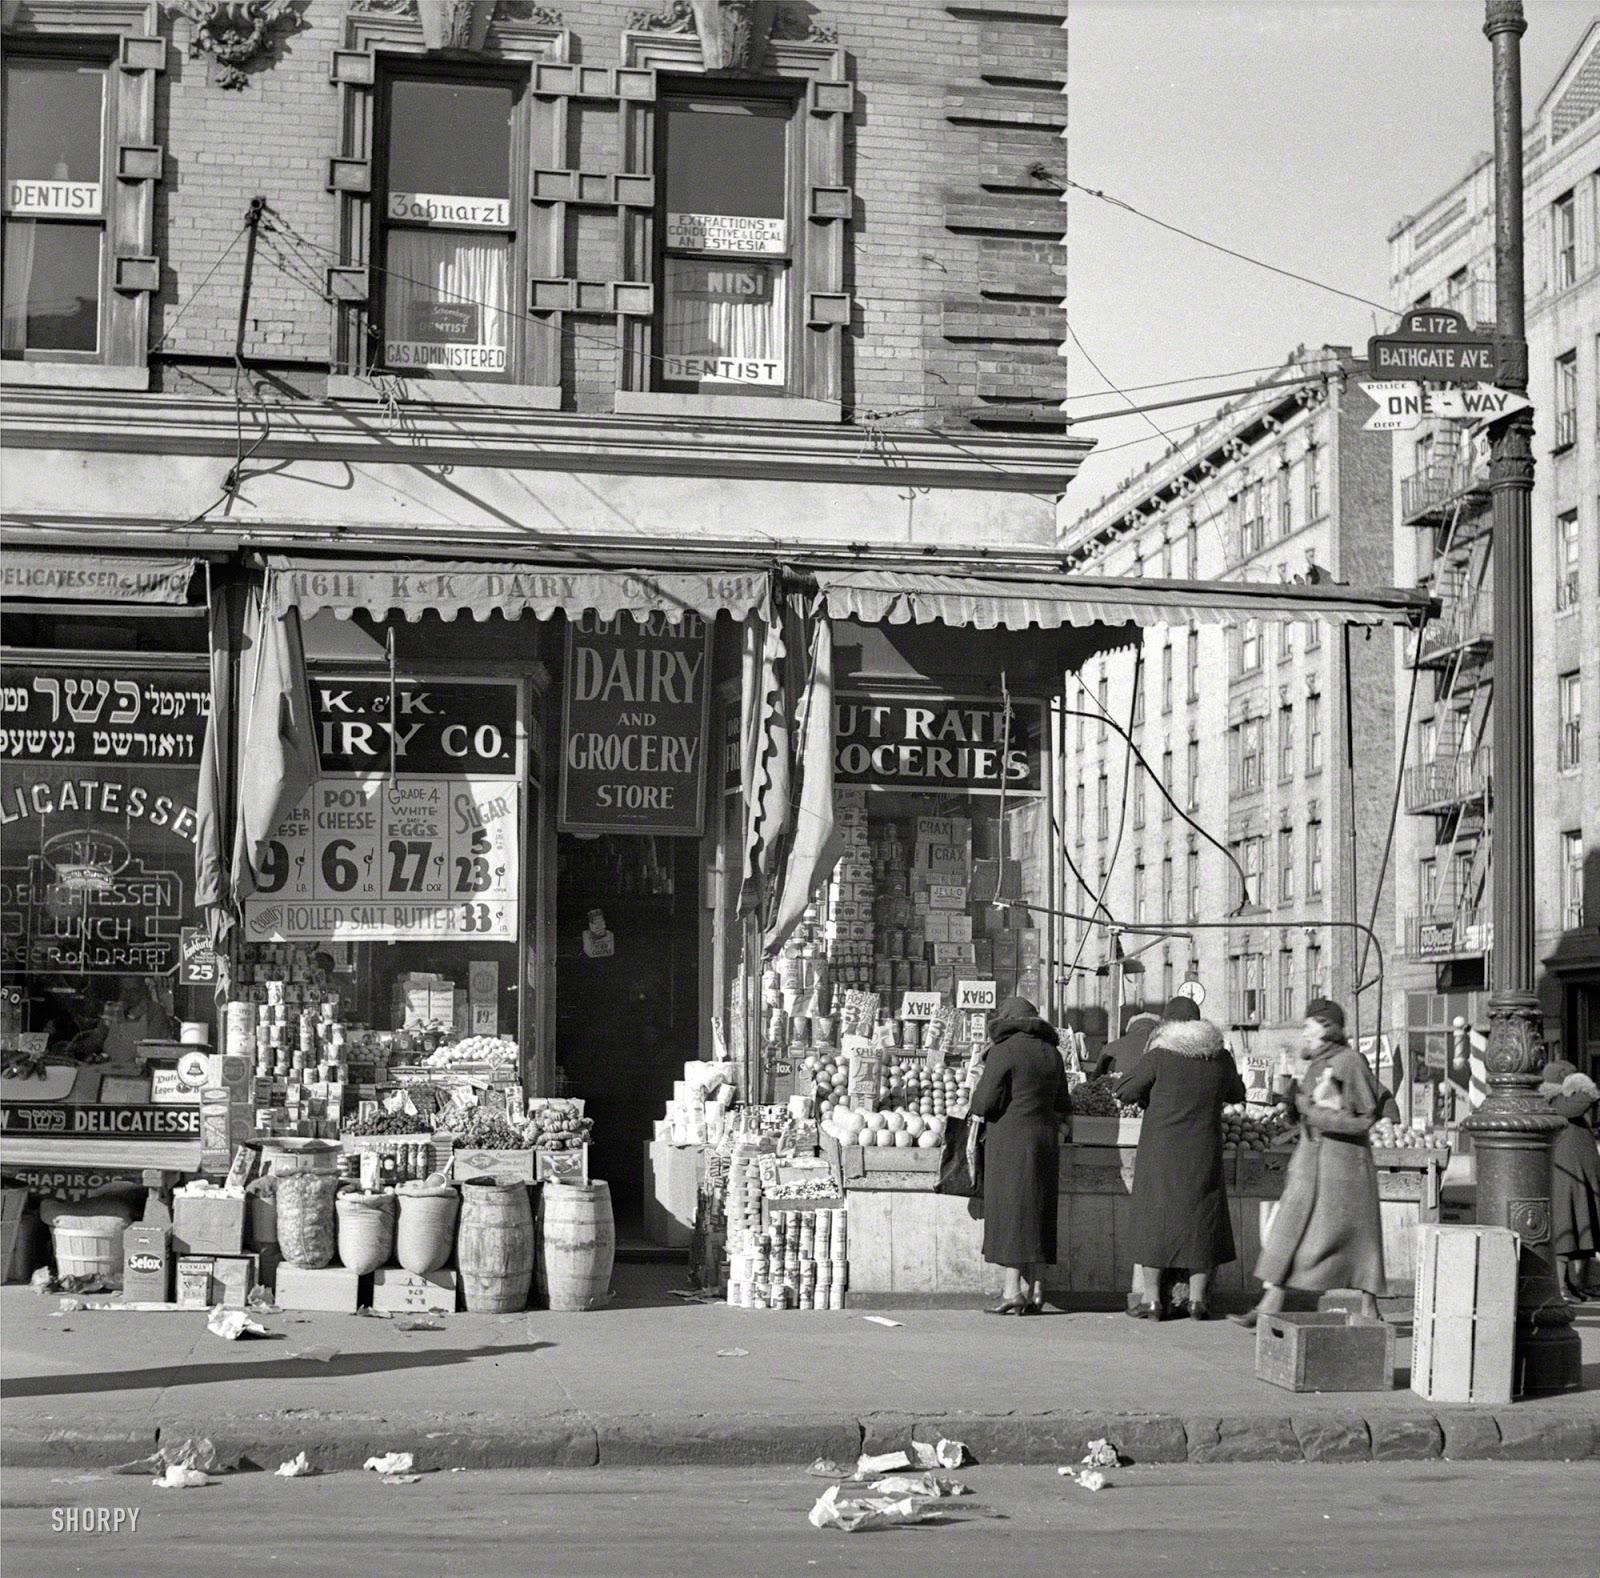 new york history geschichte k k grocery 1936. Black Bedroom Furniture Sets. Home Design Ideas